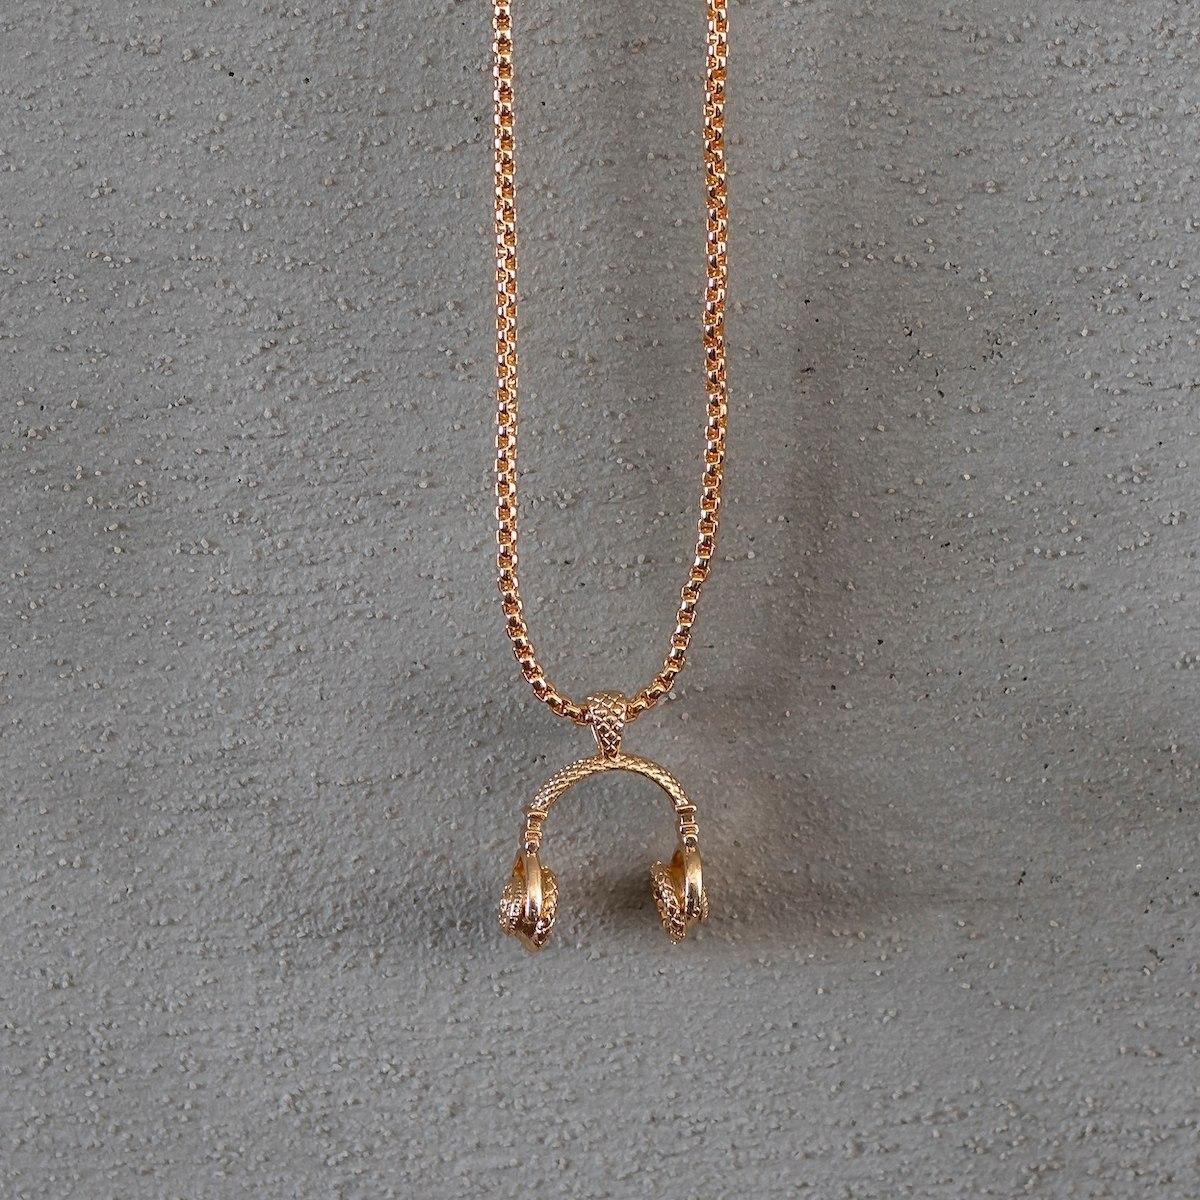 Men's Headphone Necklace Gold